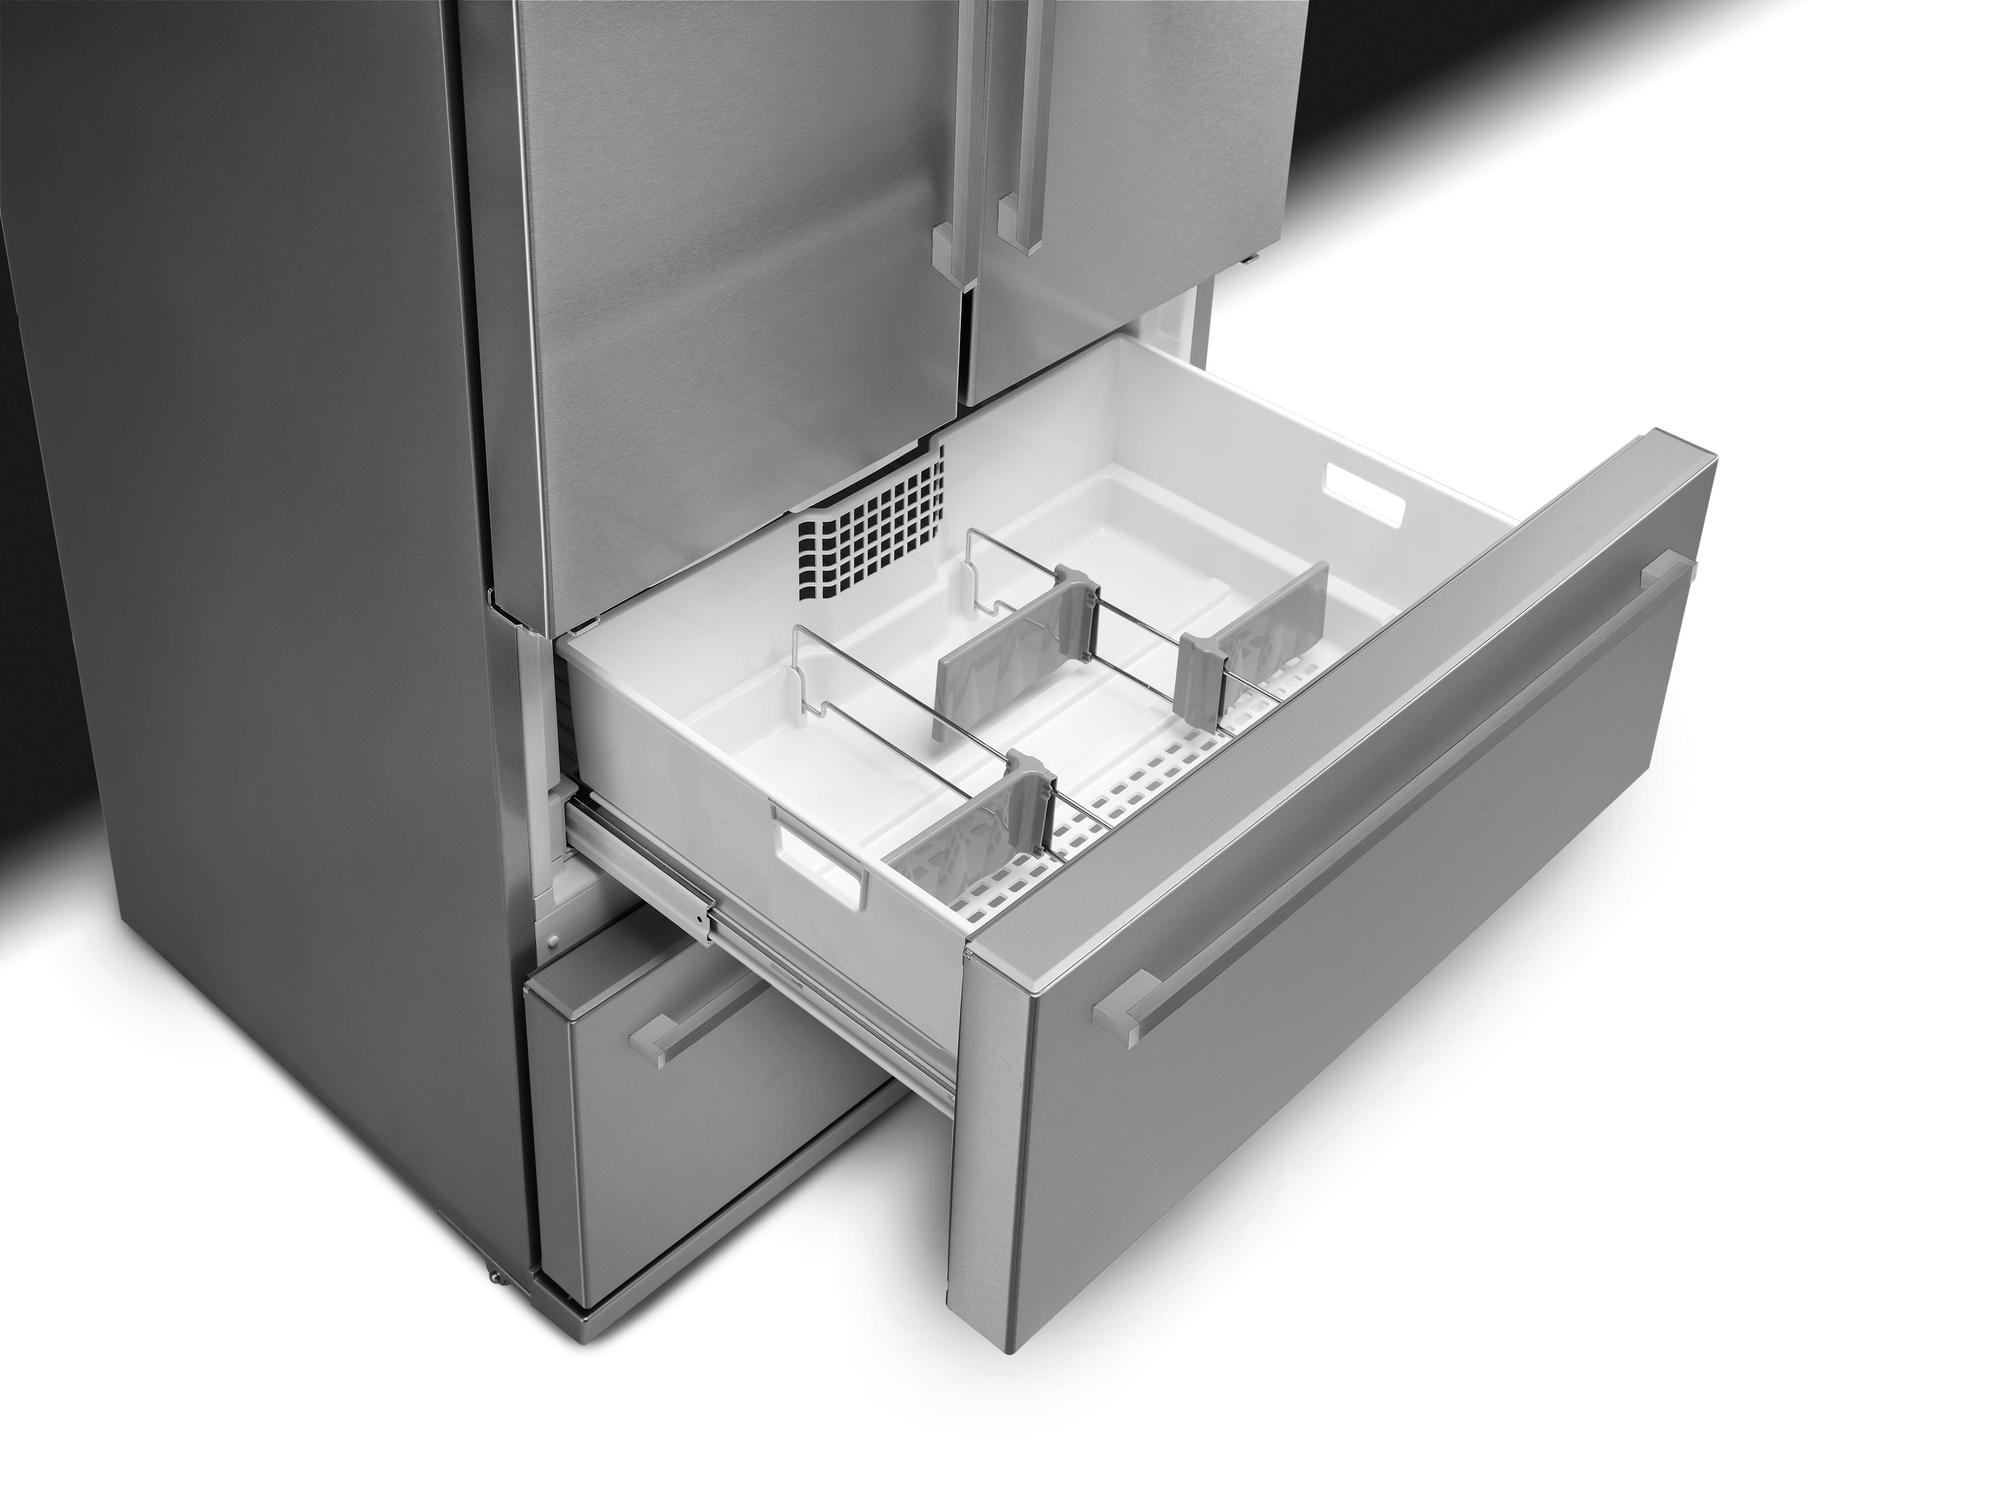 Smeg Kühlschrank Zweitürig : Smeg side by side kühlschrank fq55fx2pe 84 cm welter & welter köln